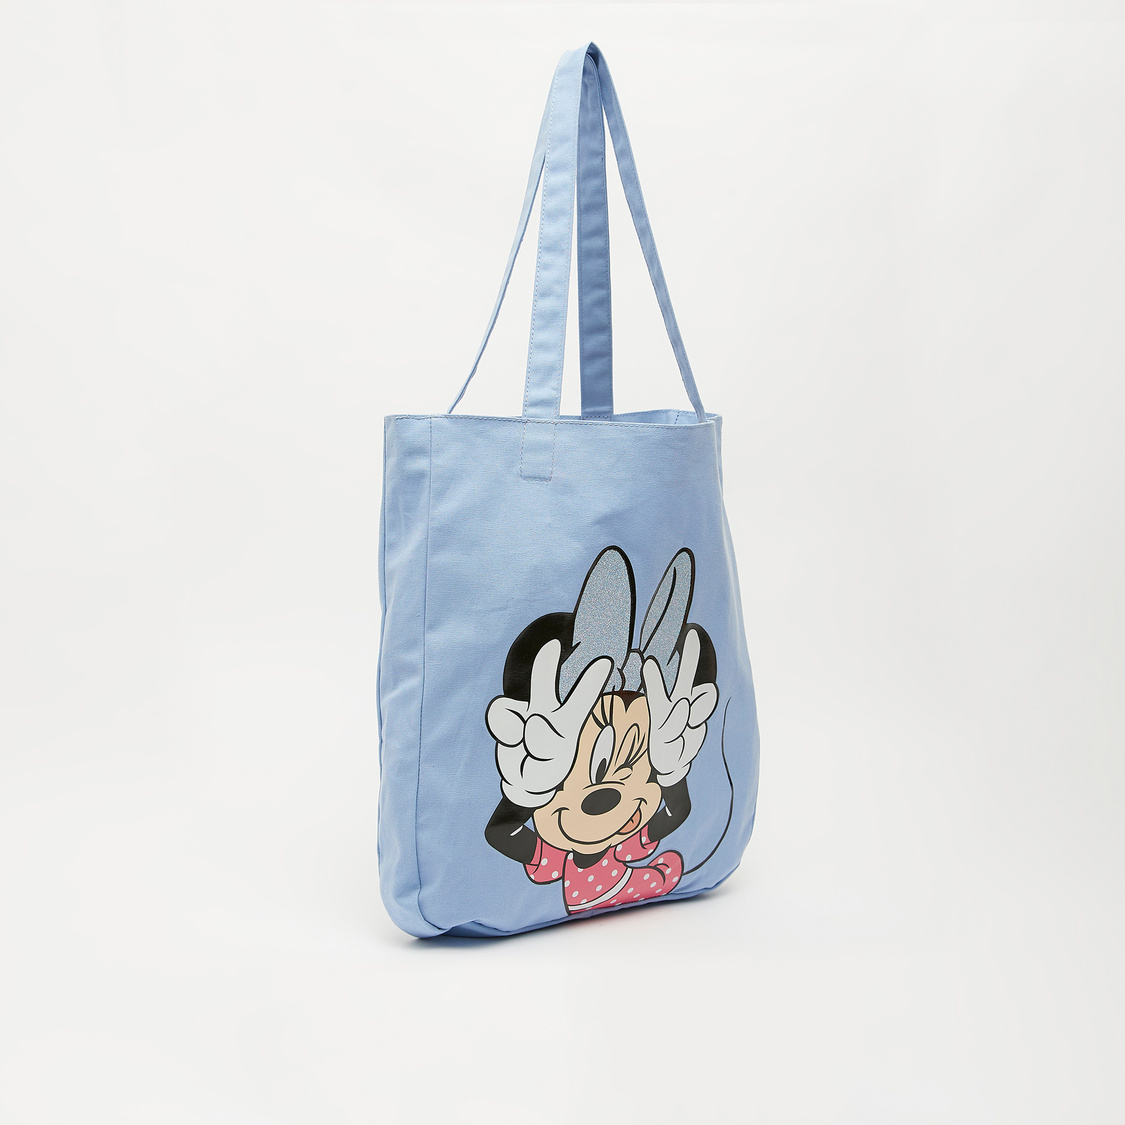 Minnie Mouse Print Shopper Bag with Shoulder Straps